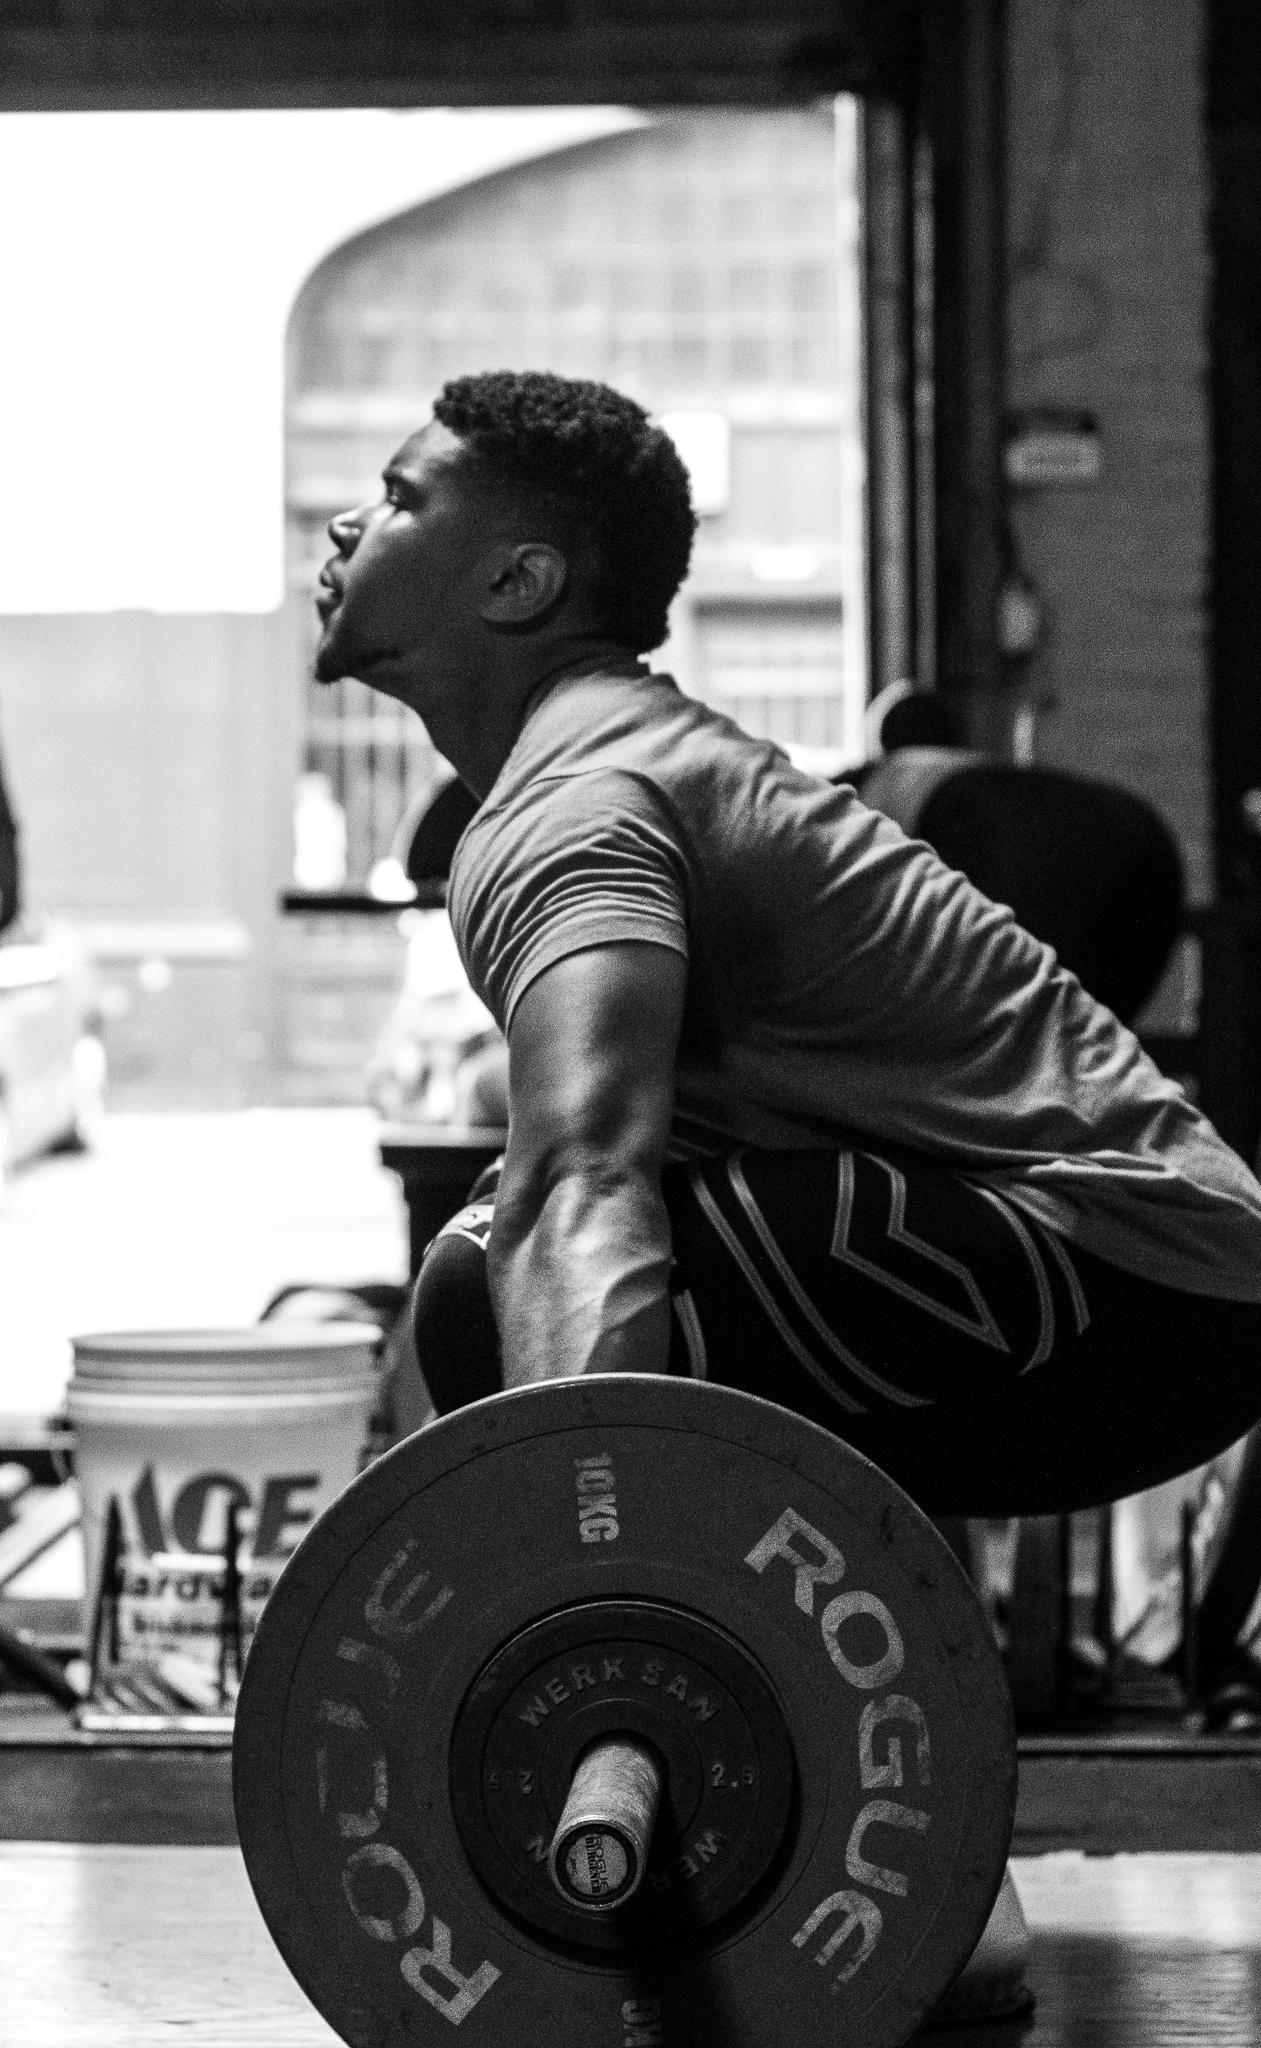 james-wright-visit-brooklyn-new-york-weightlifting-coach-teammates-october-2016 (6 of 92).jpg